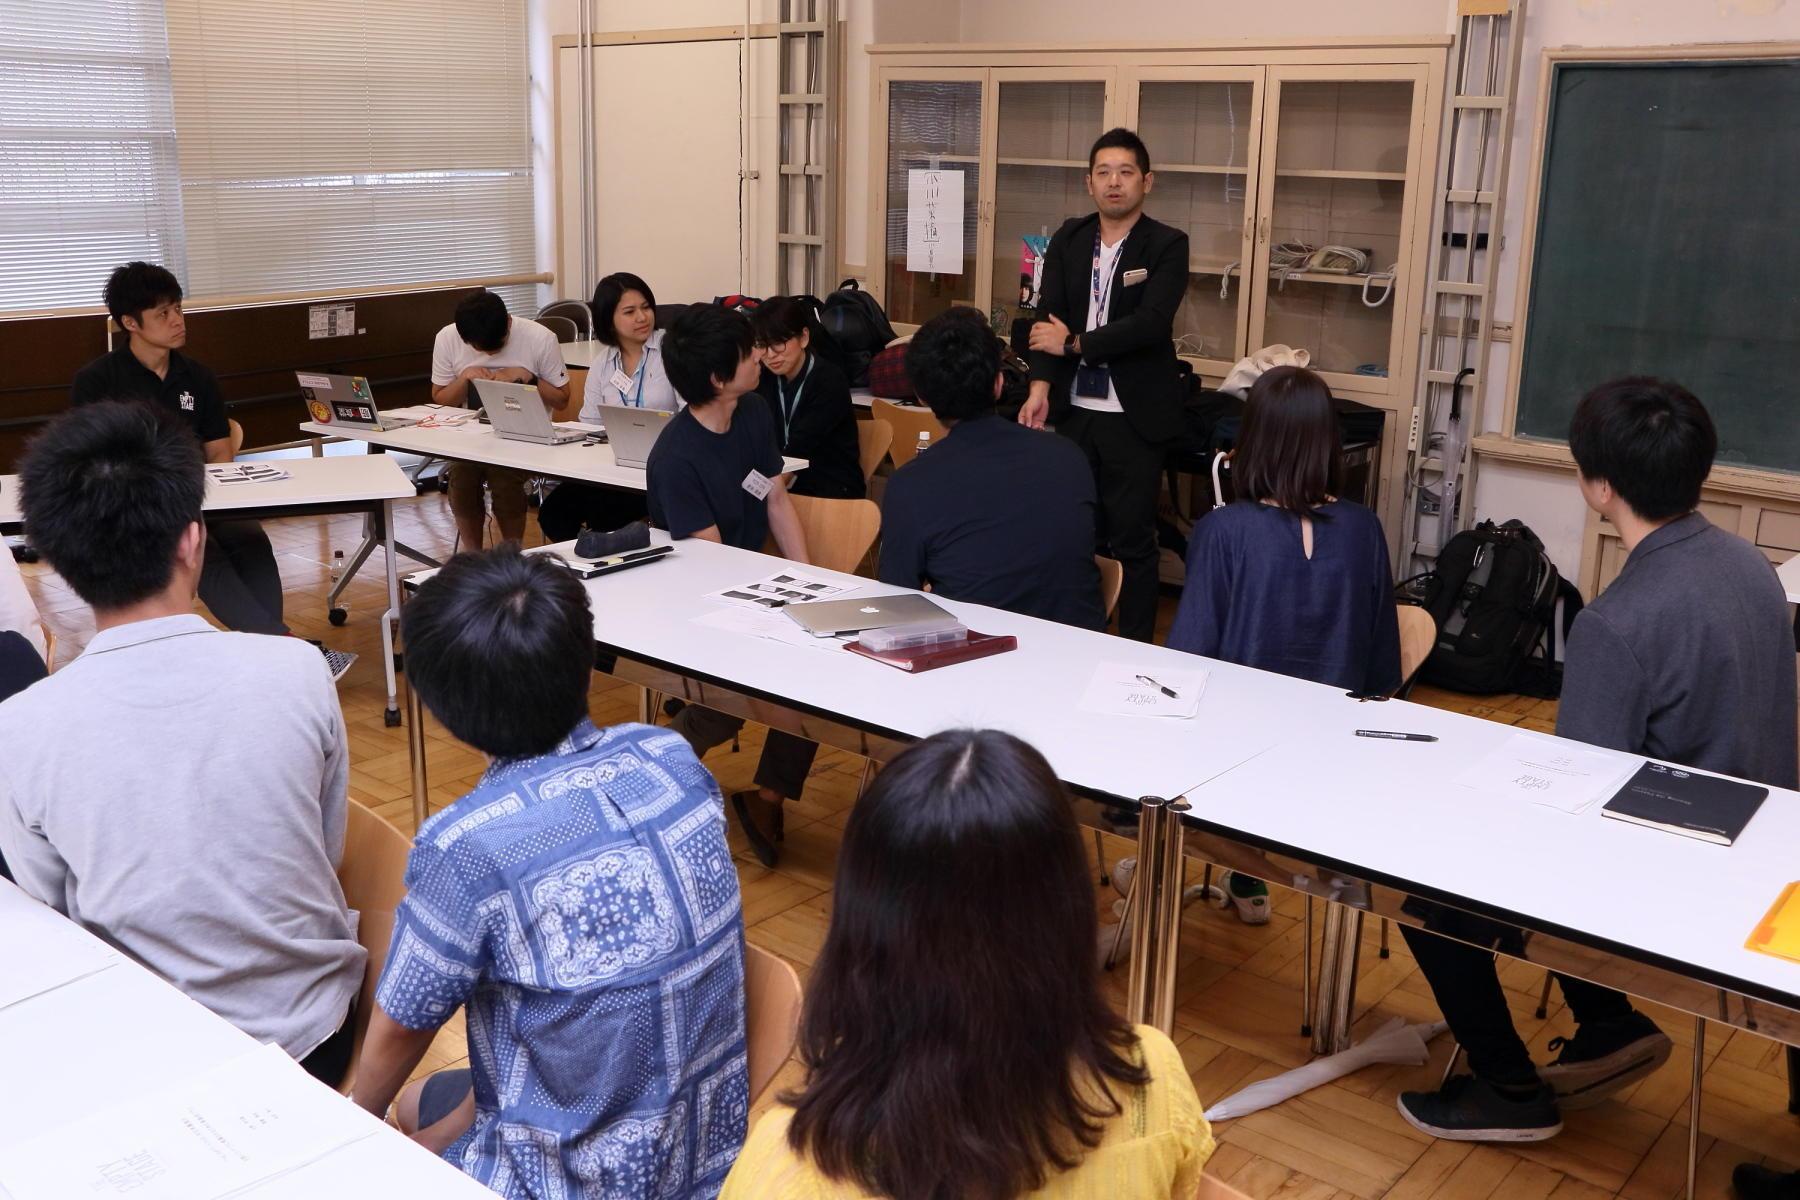 http://news.yoshimoto.co.jp/20170910064302-eed21a107f7489b12f643b3d299ca827f78a0e64.jpg